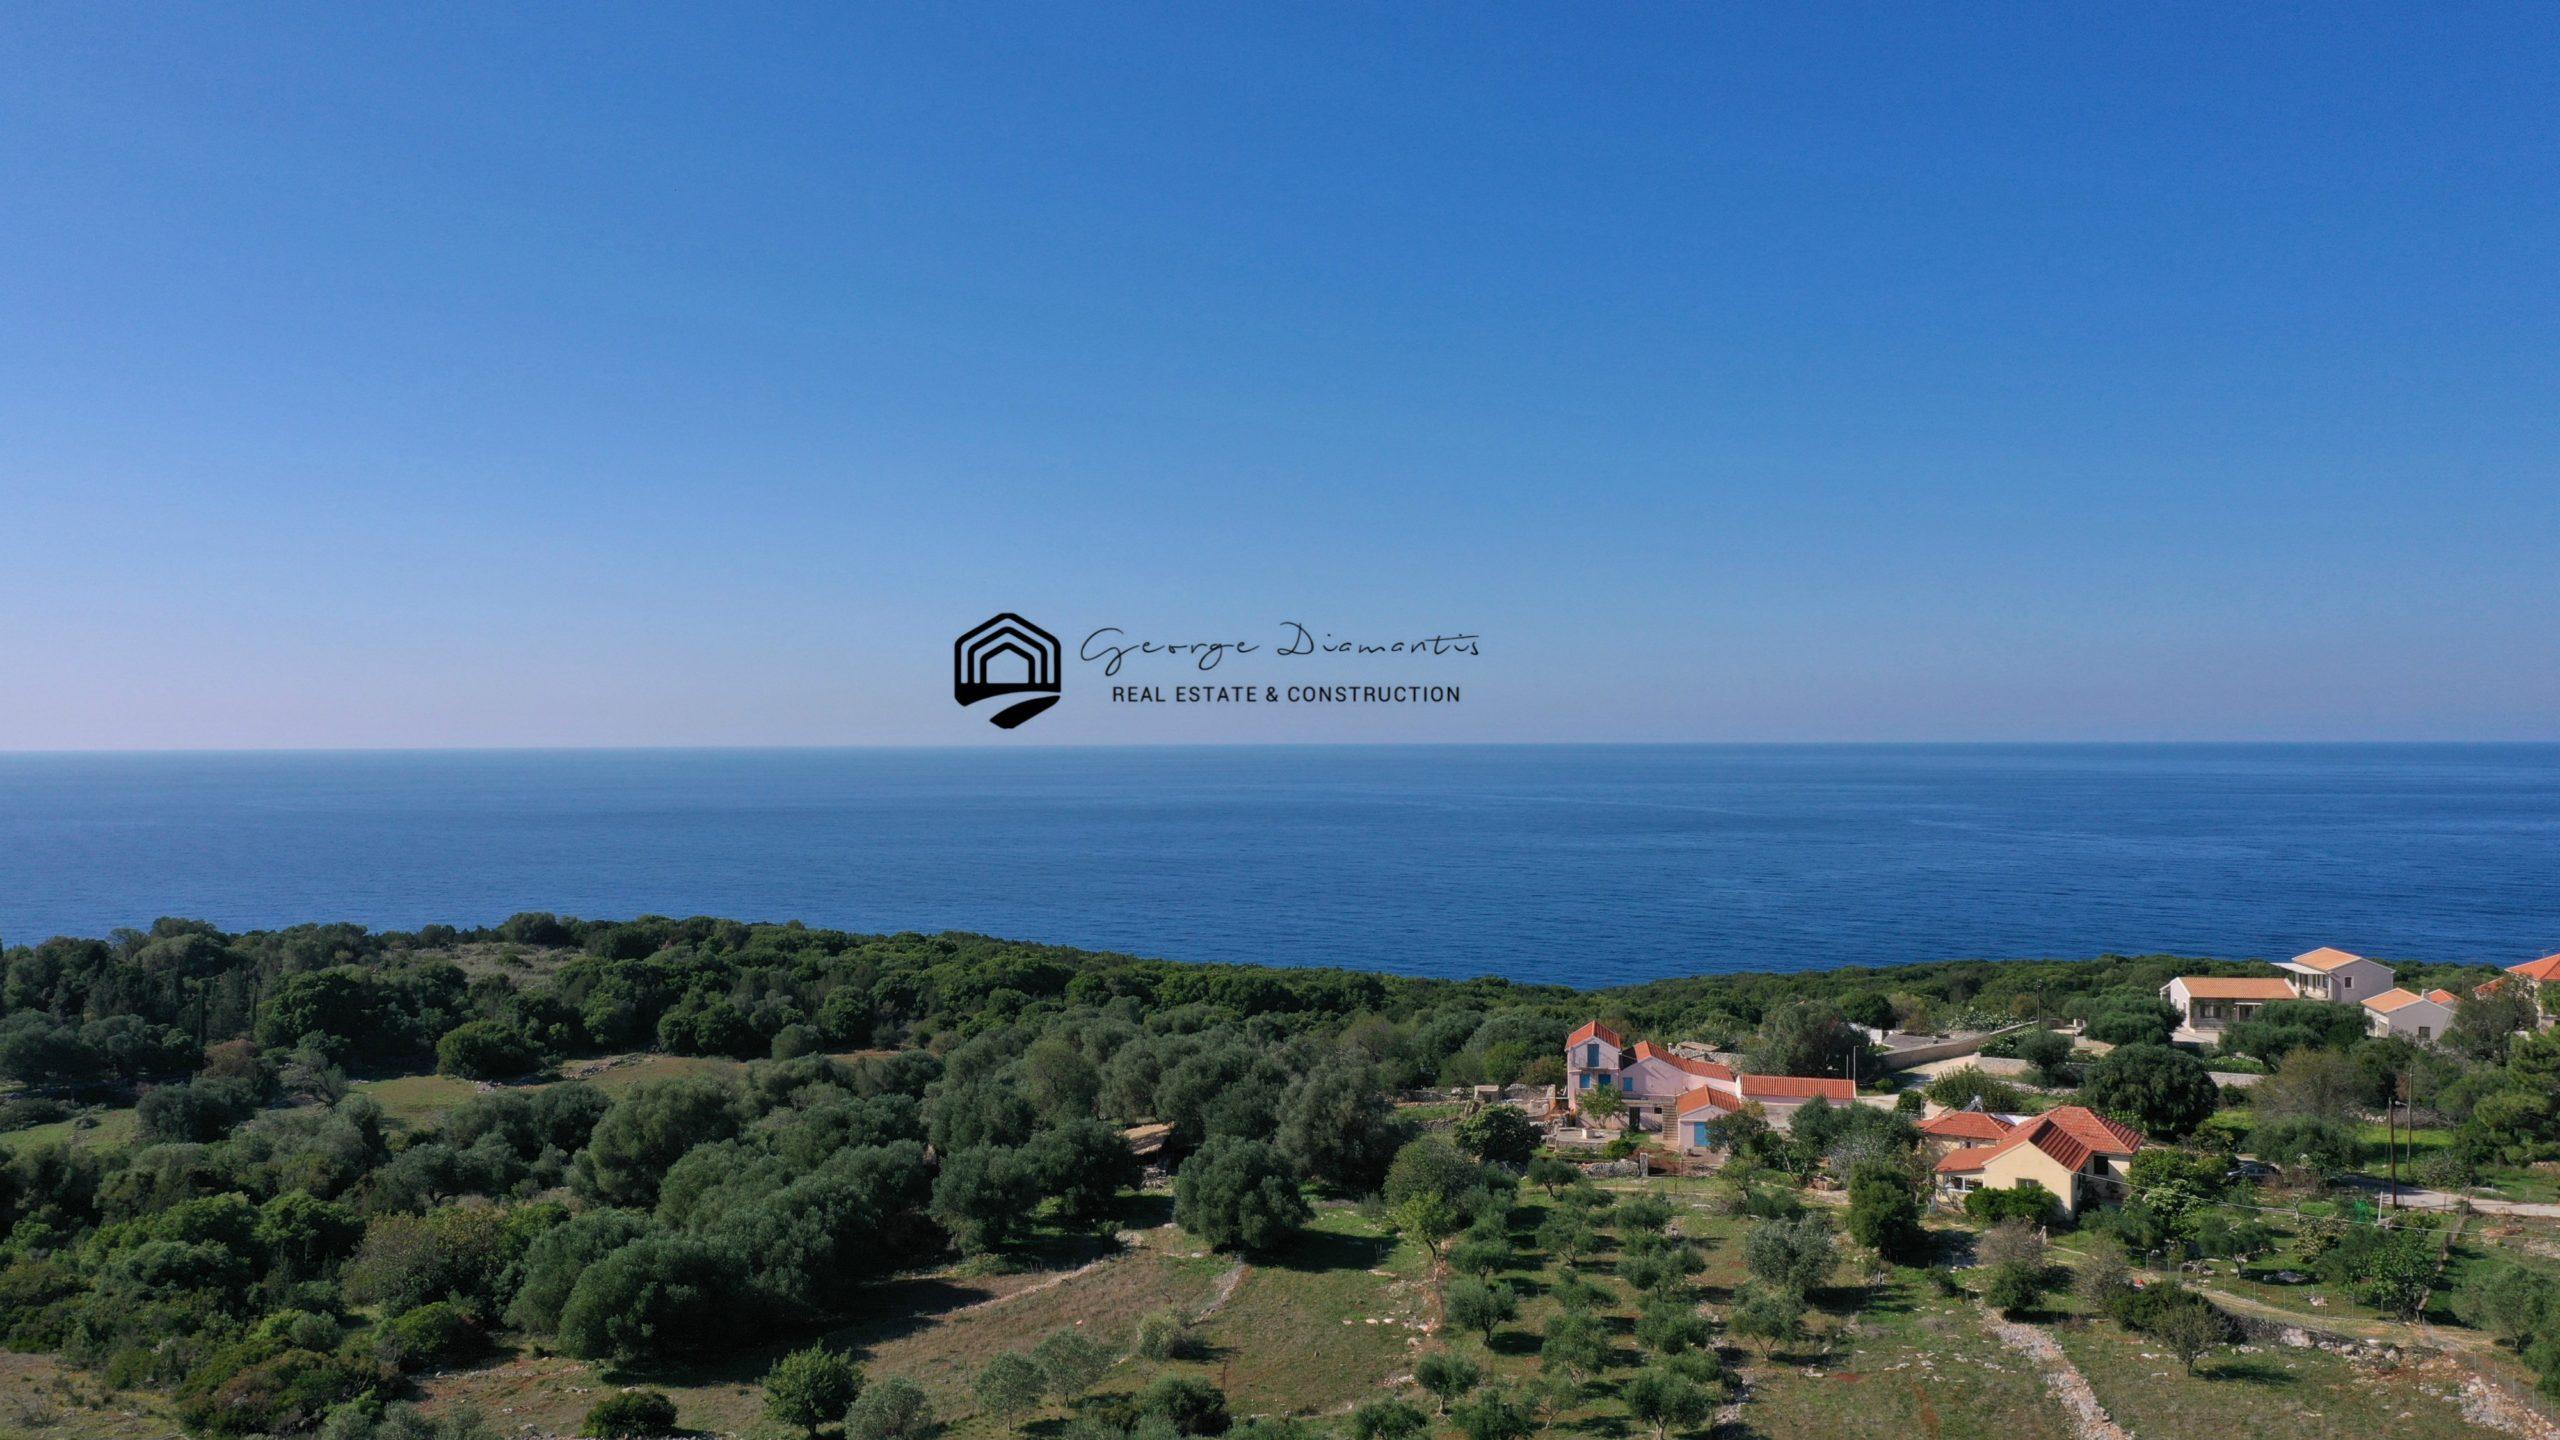 Land Plot For Sale In Antipata Erisou.